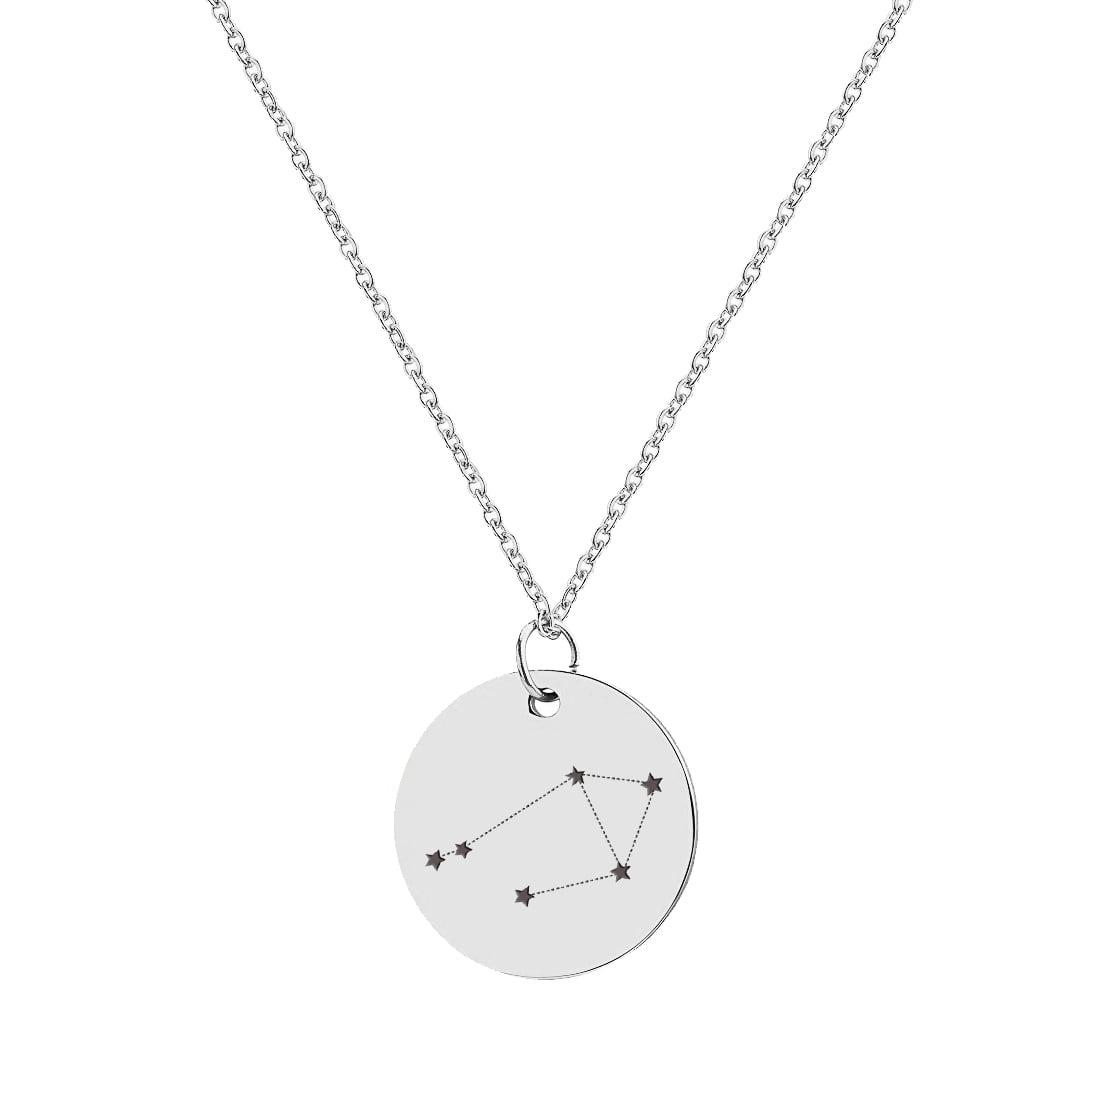 Silver Libra Constellation Necklace Night Sky Libra Gifts Libra Necklace Sterling Silver Libra Zodiac Necklace Astrology Necklace